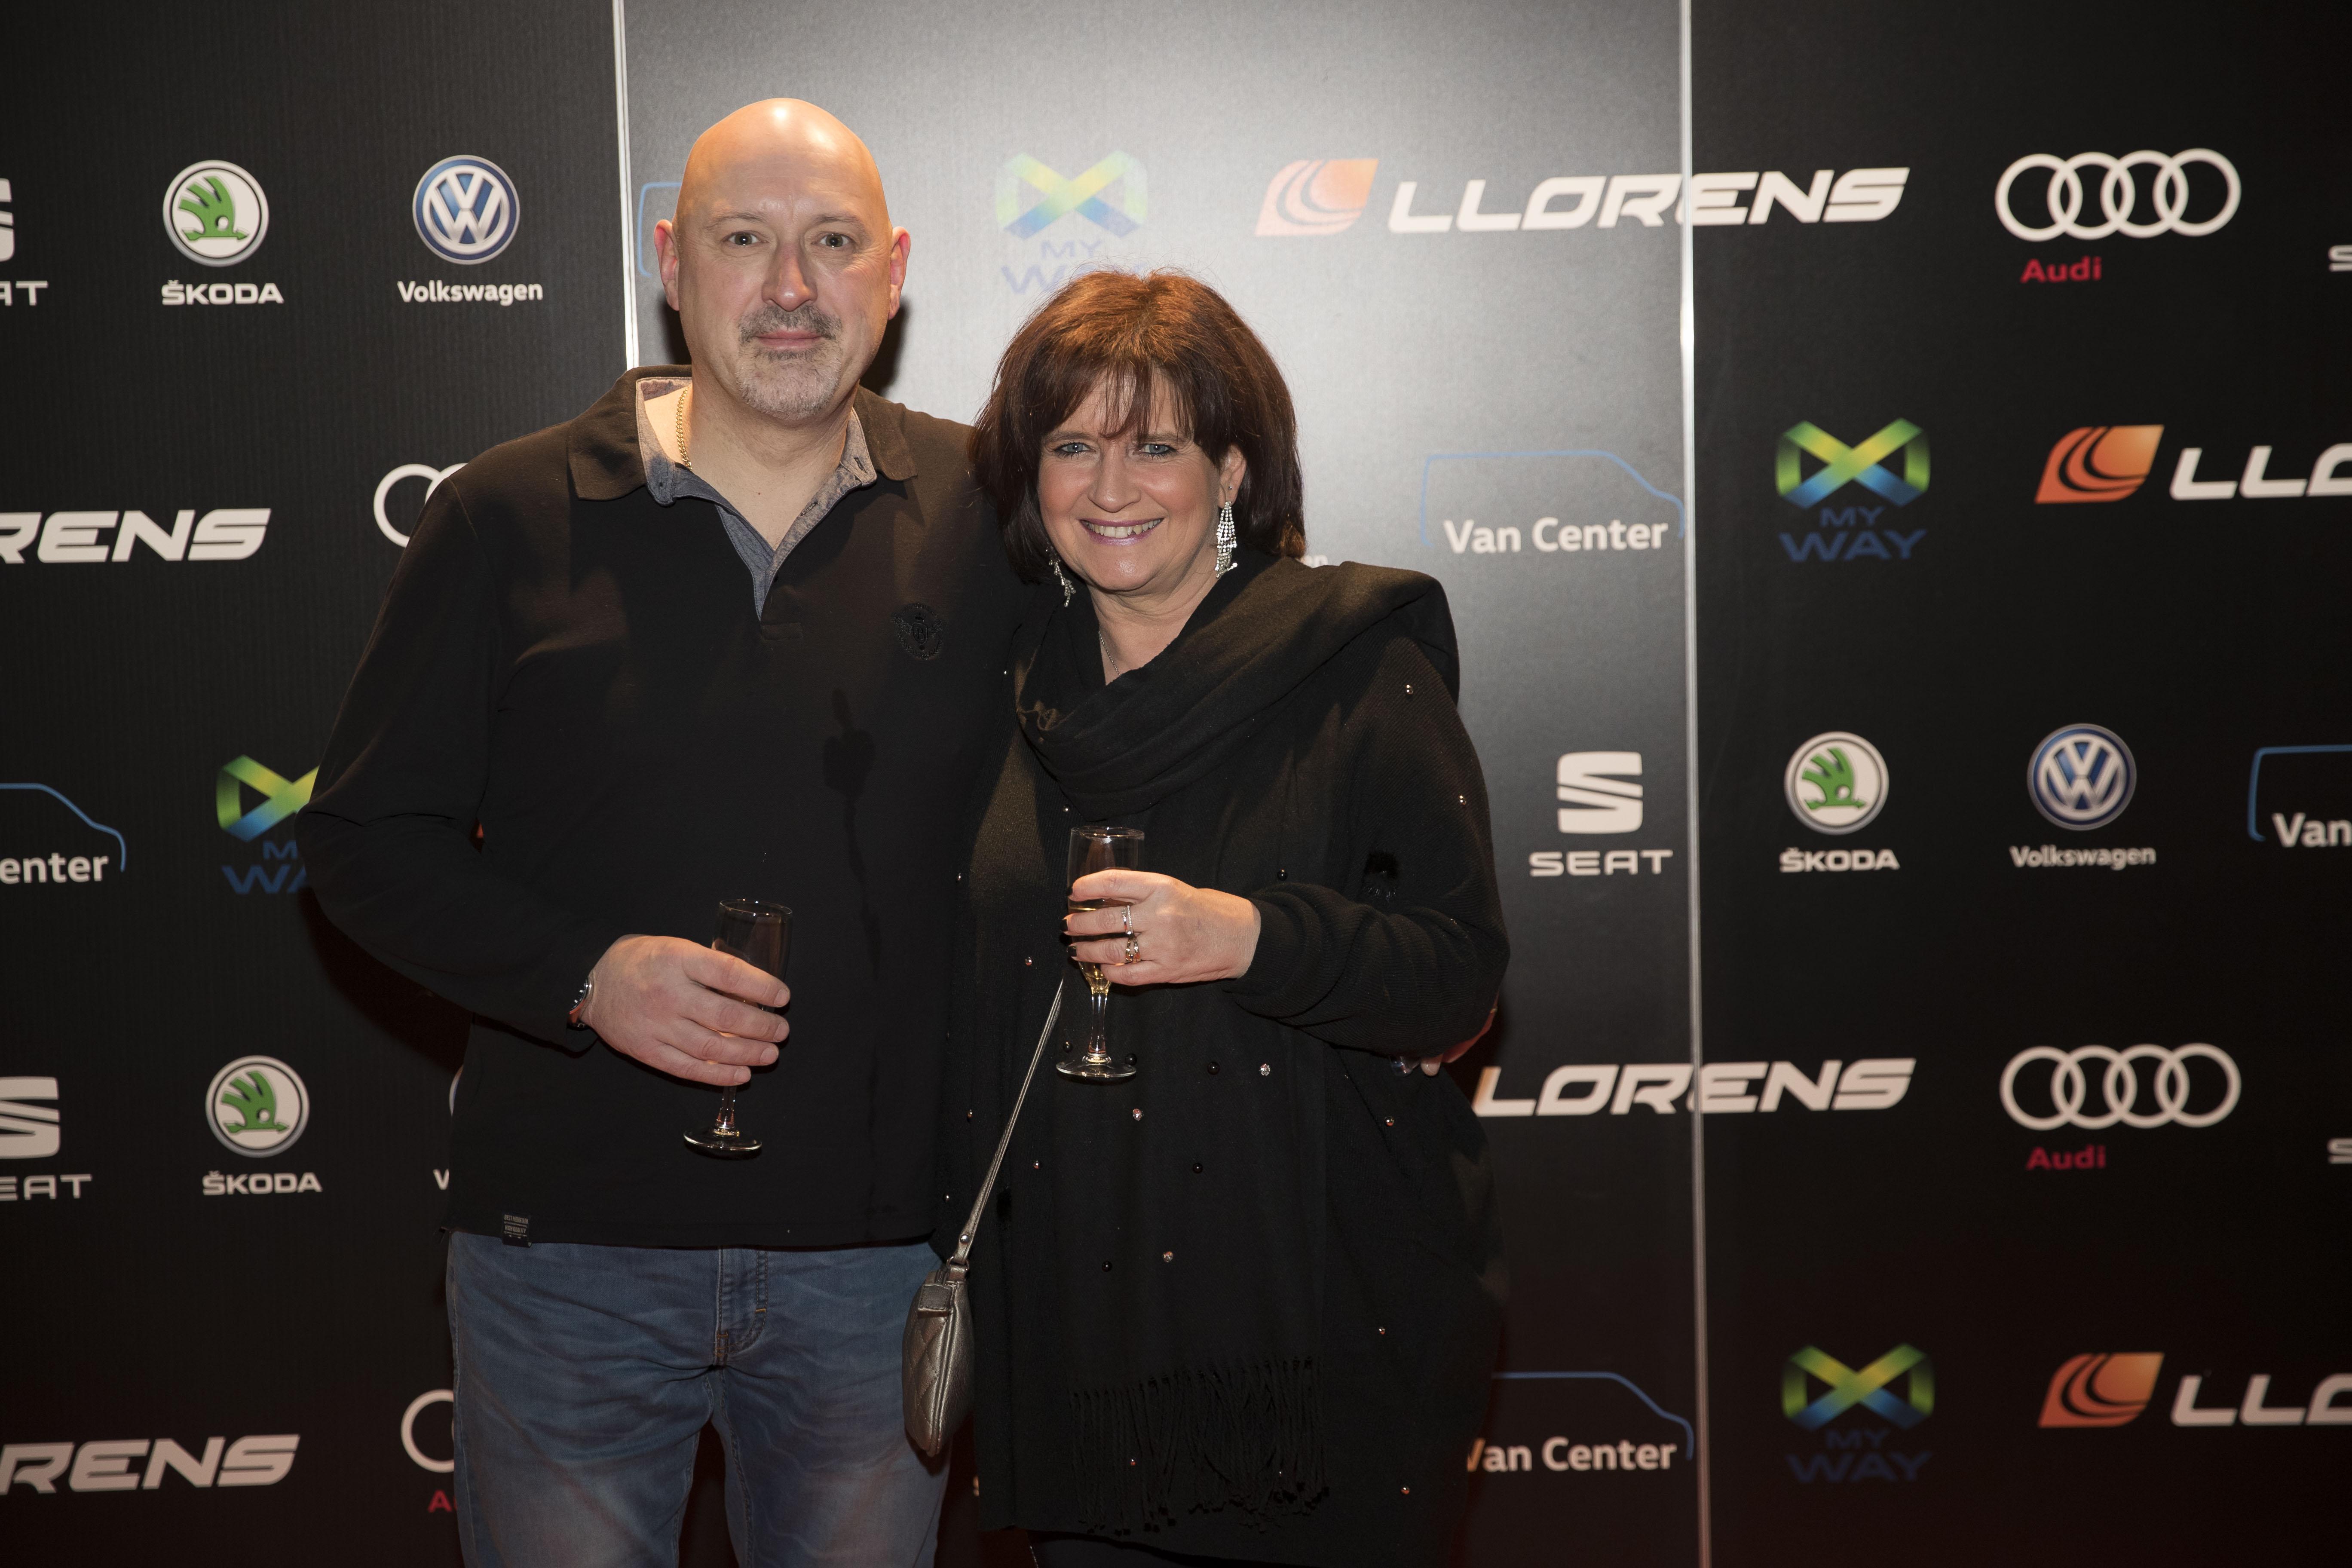 Llorens__40